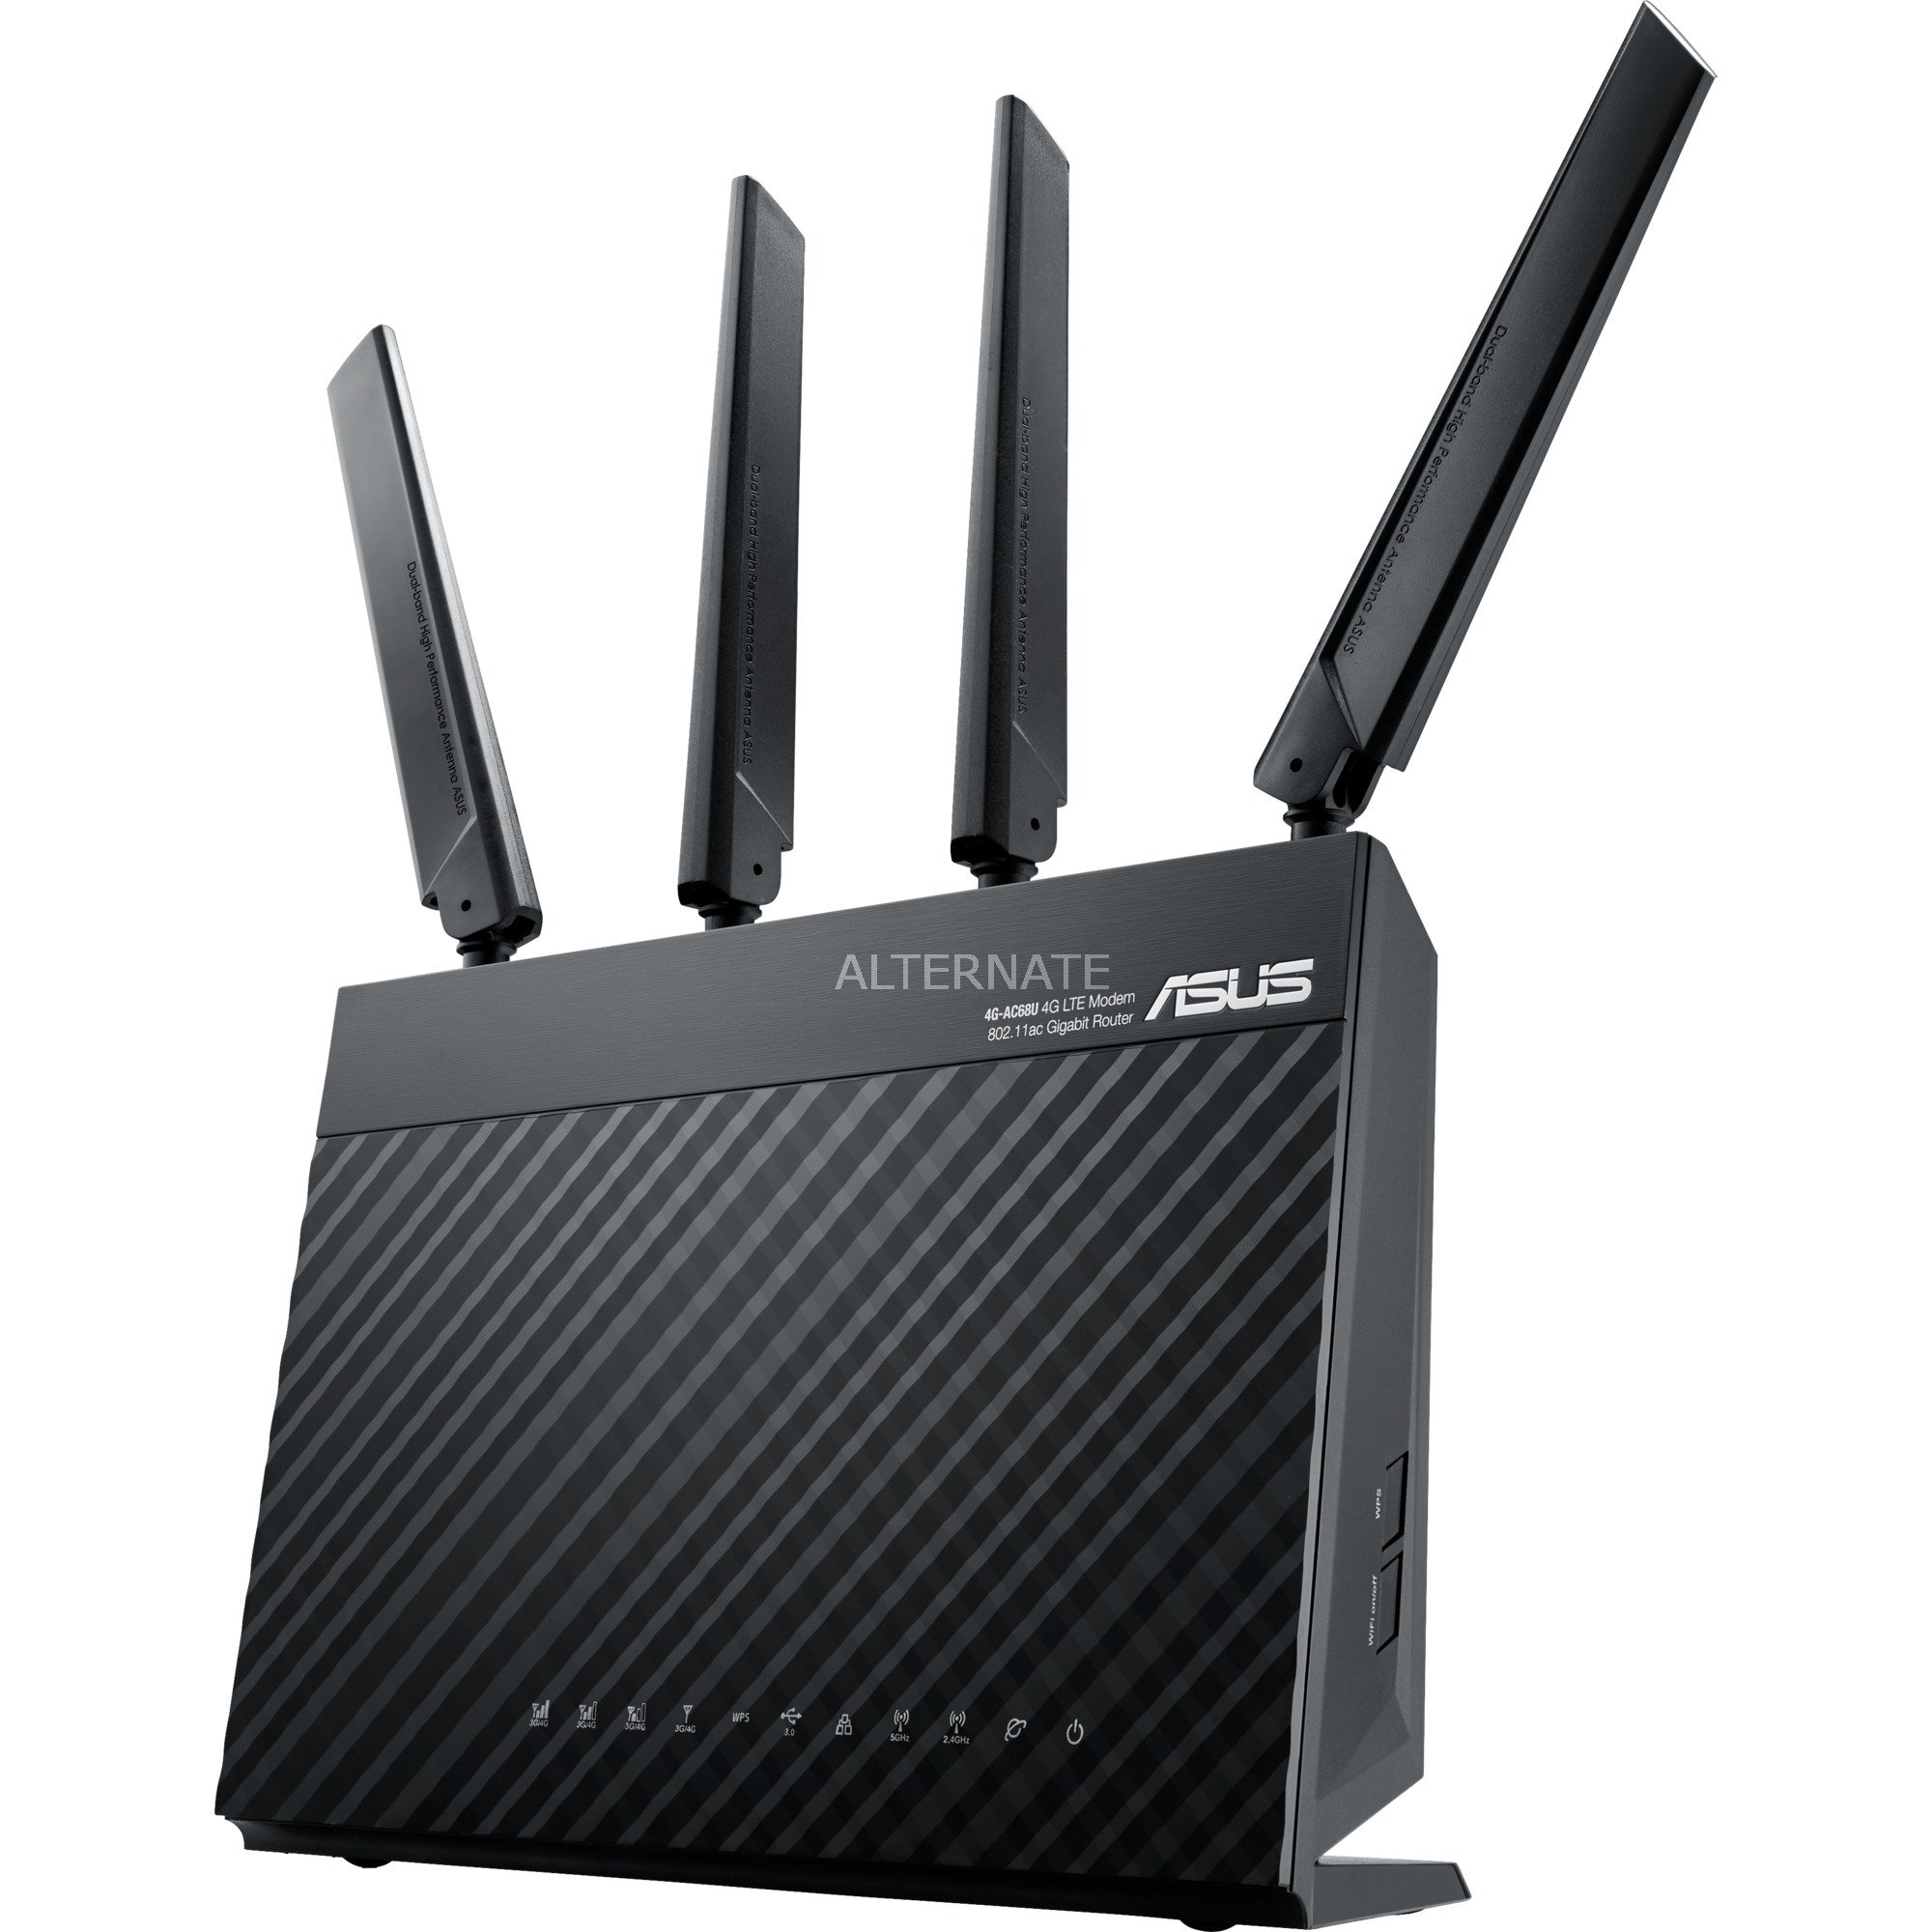 4G-AC68U Bi-bande (2,4 GHz / 5 GHz) Gigabit Ethernet 3G 4G Noir routeur sans fil